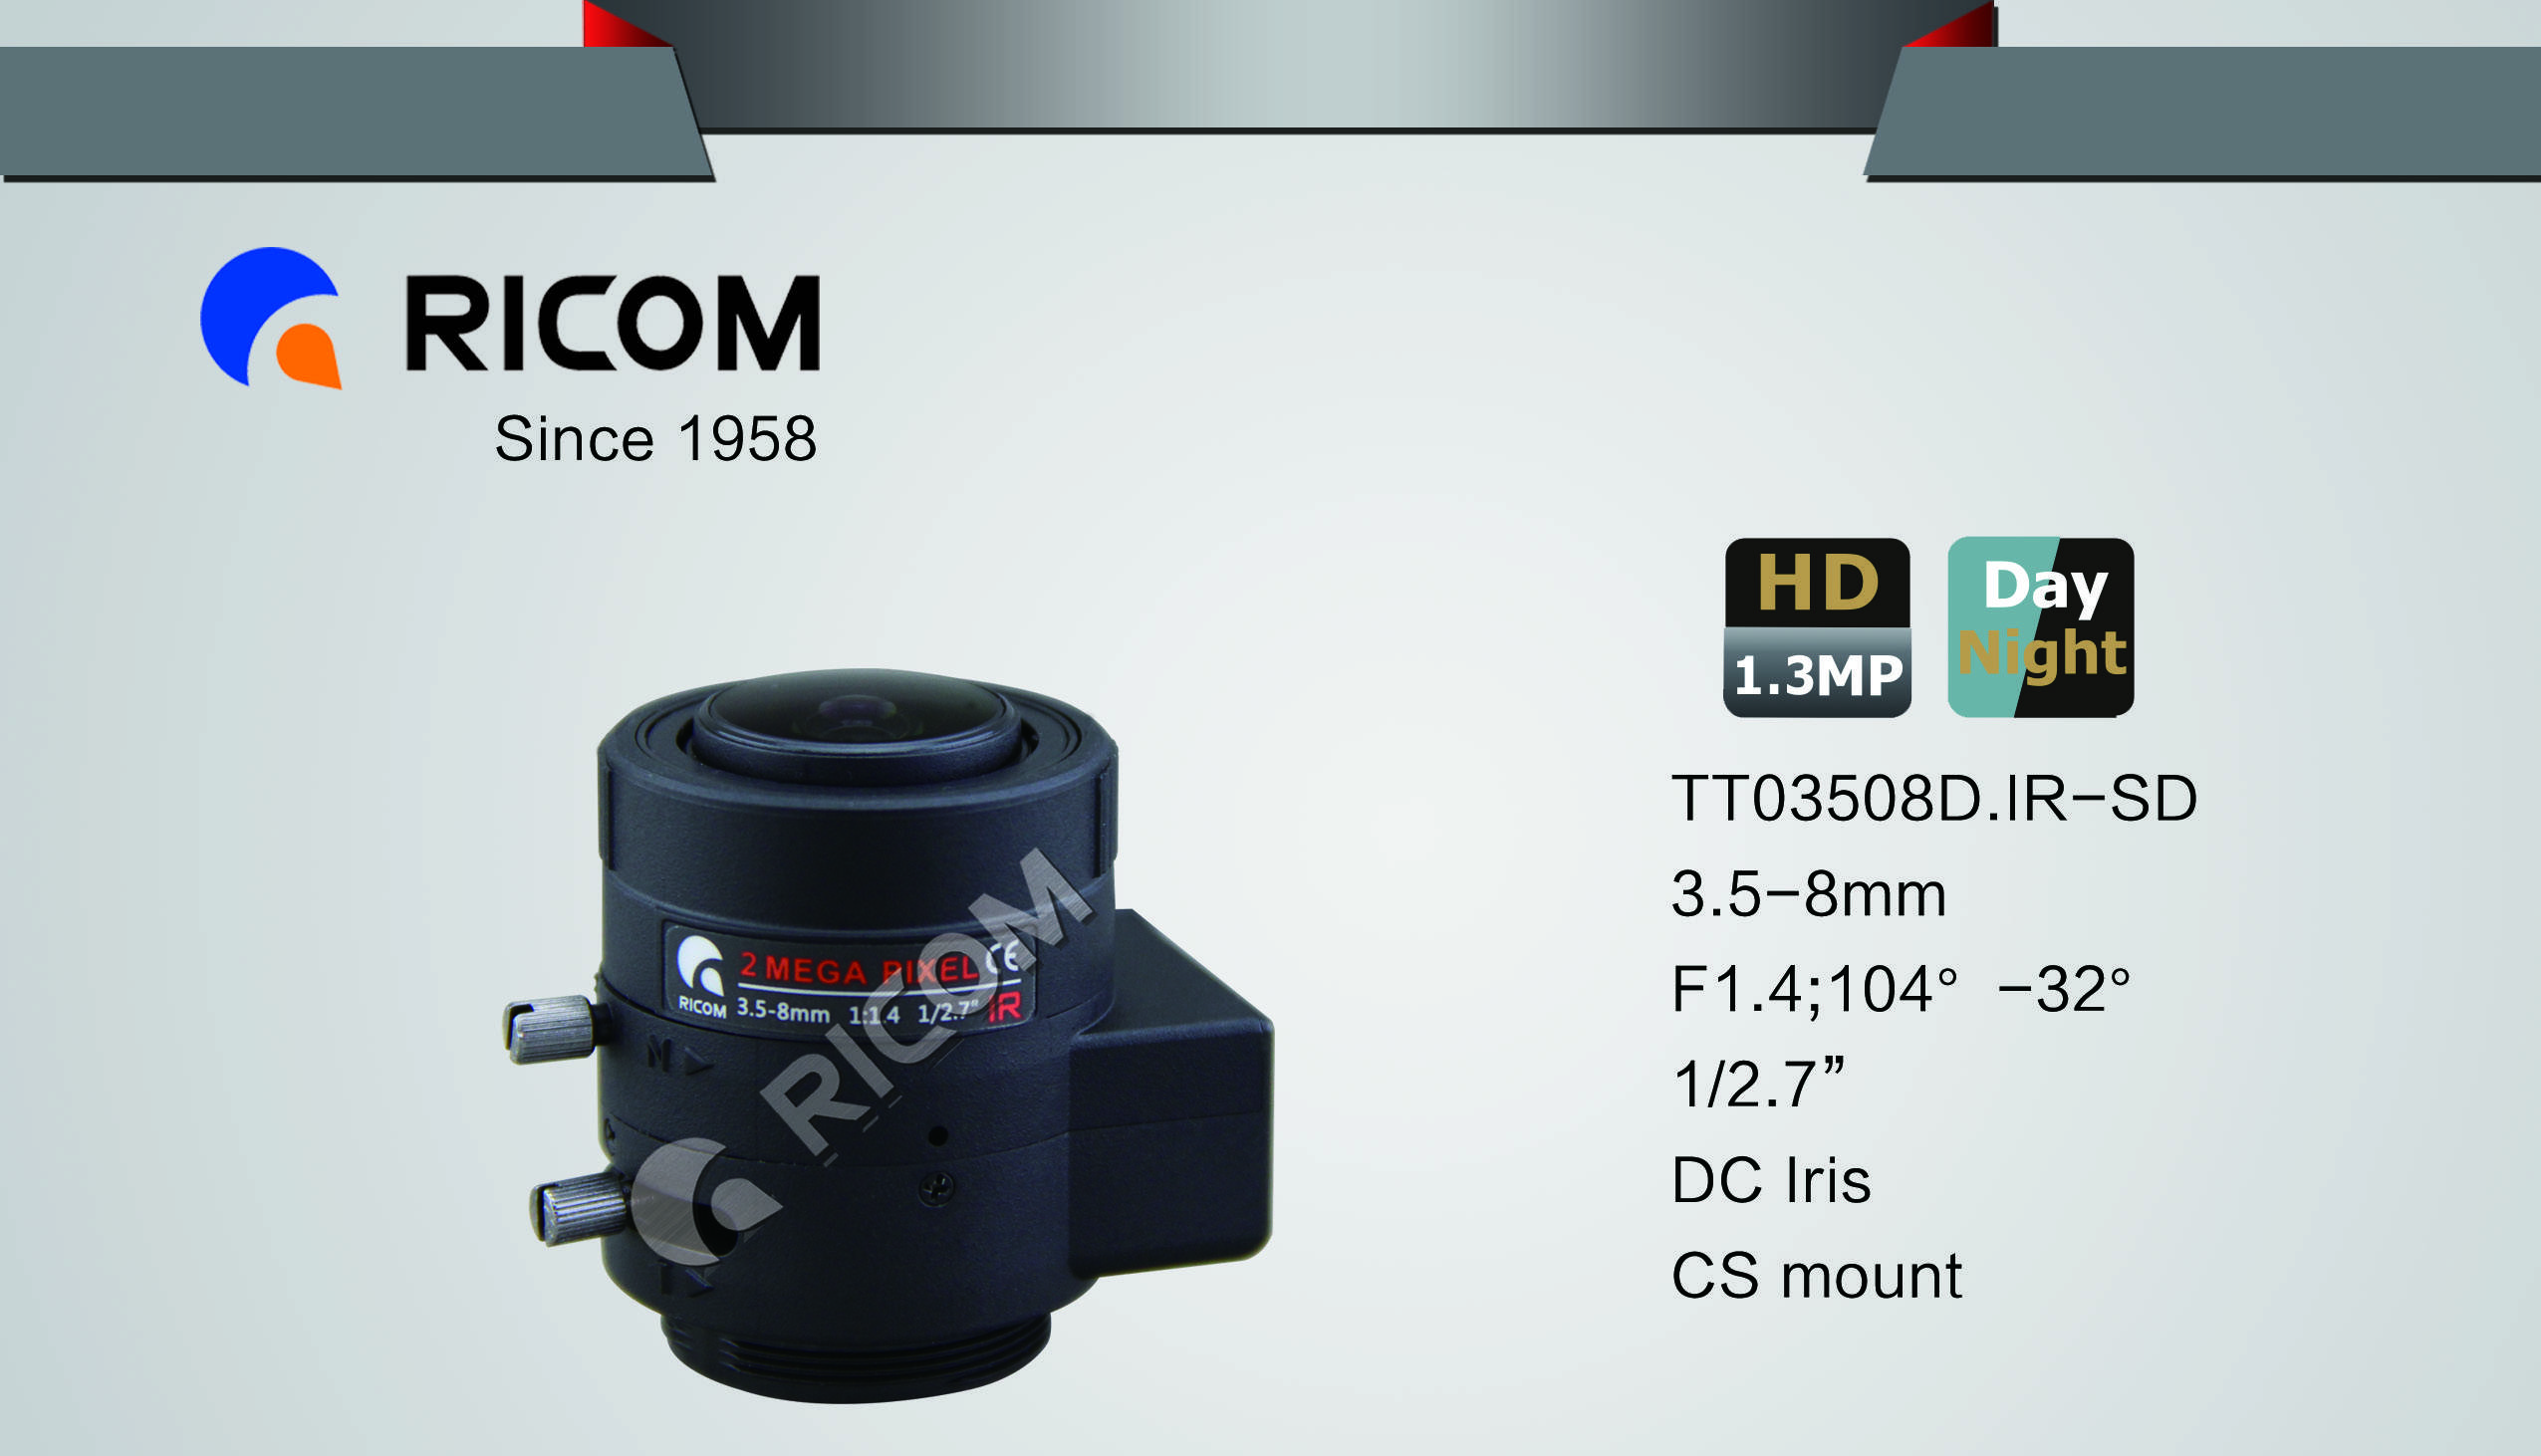 TT03508D.IR-SD